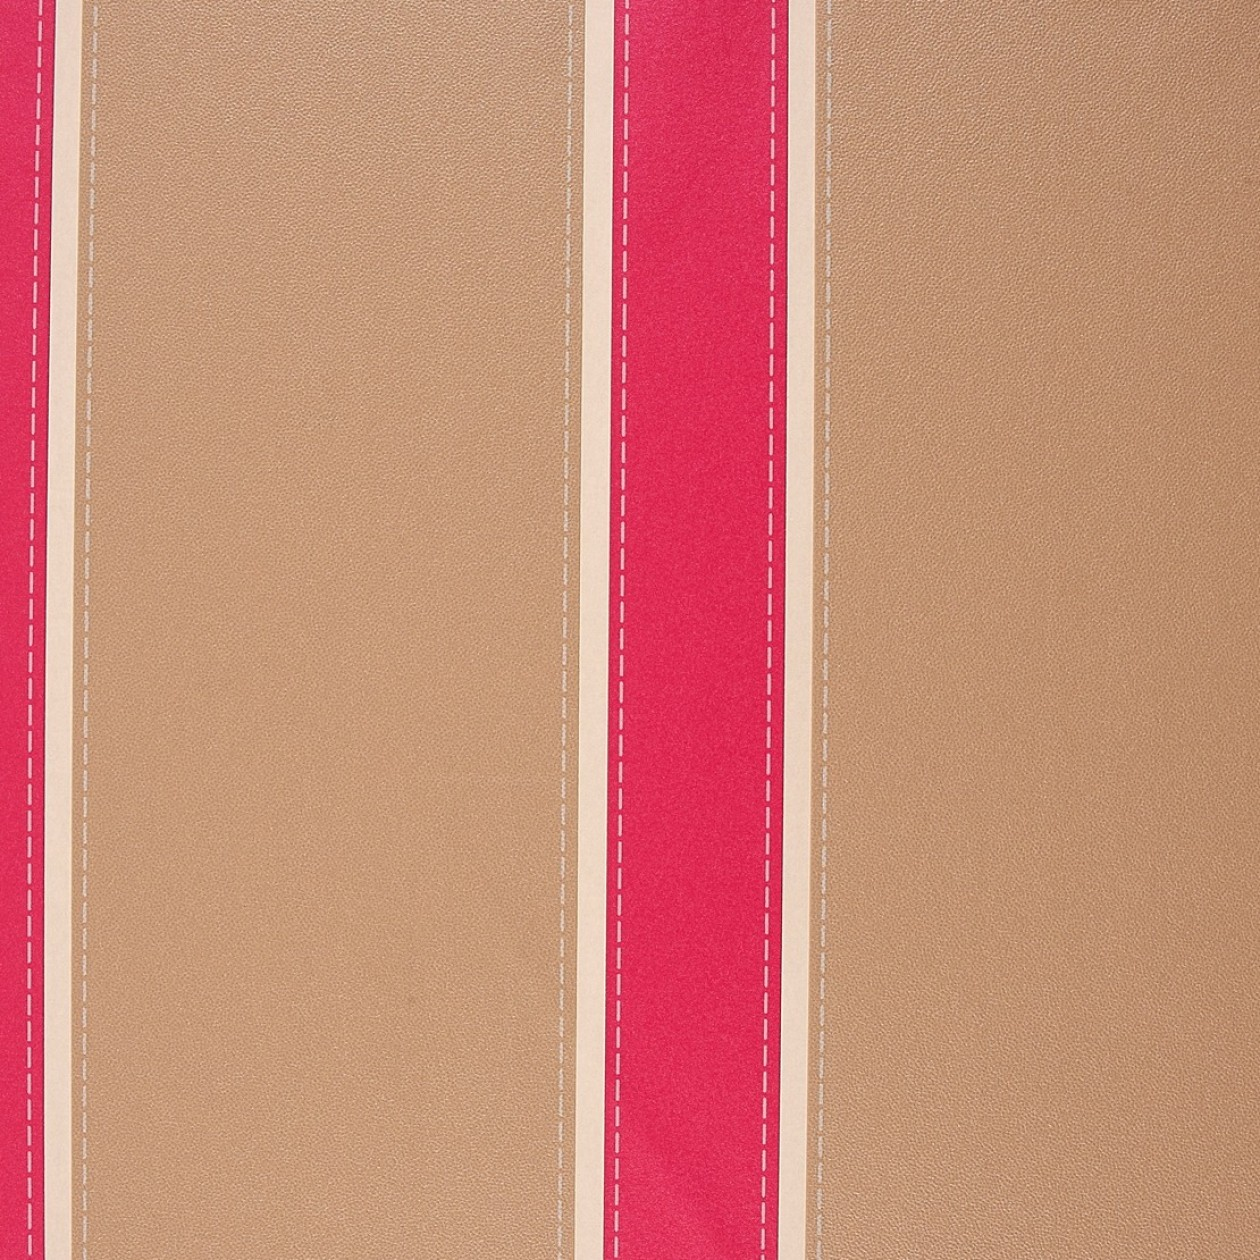 Французские обои Caselio,  коллекция Elegante, артикулELG60524013